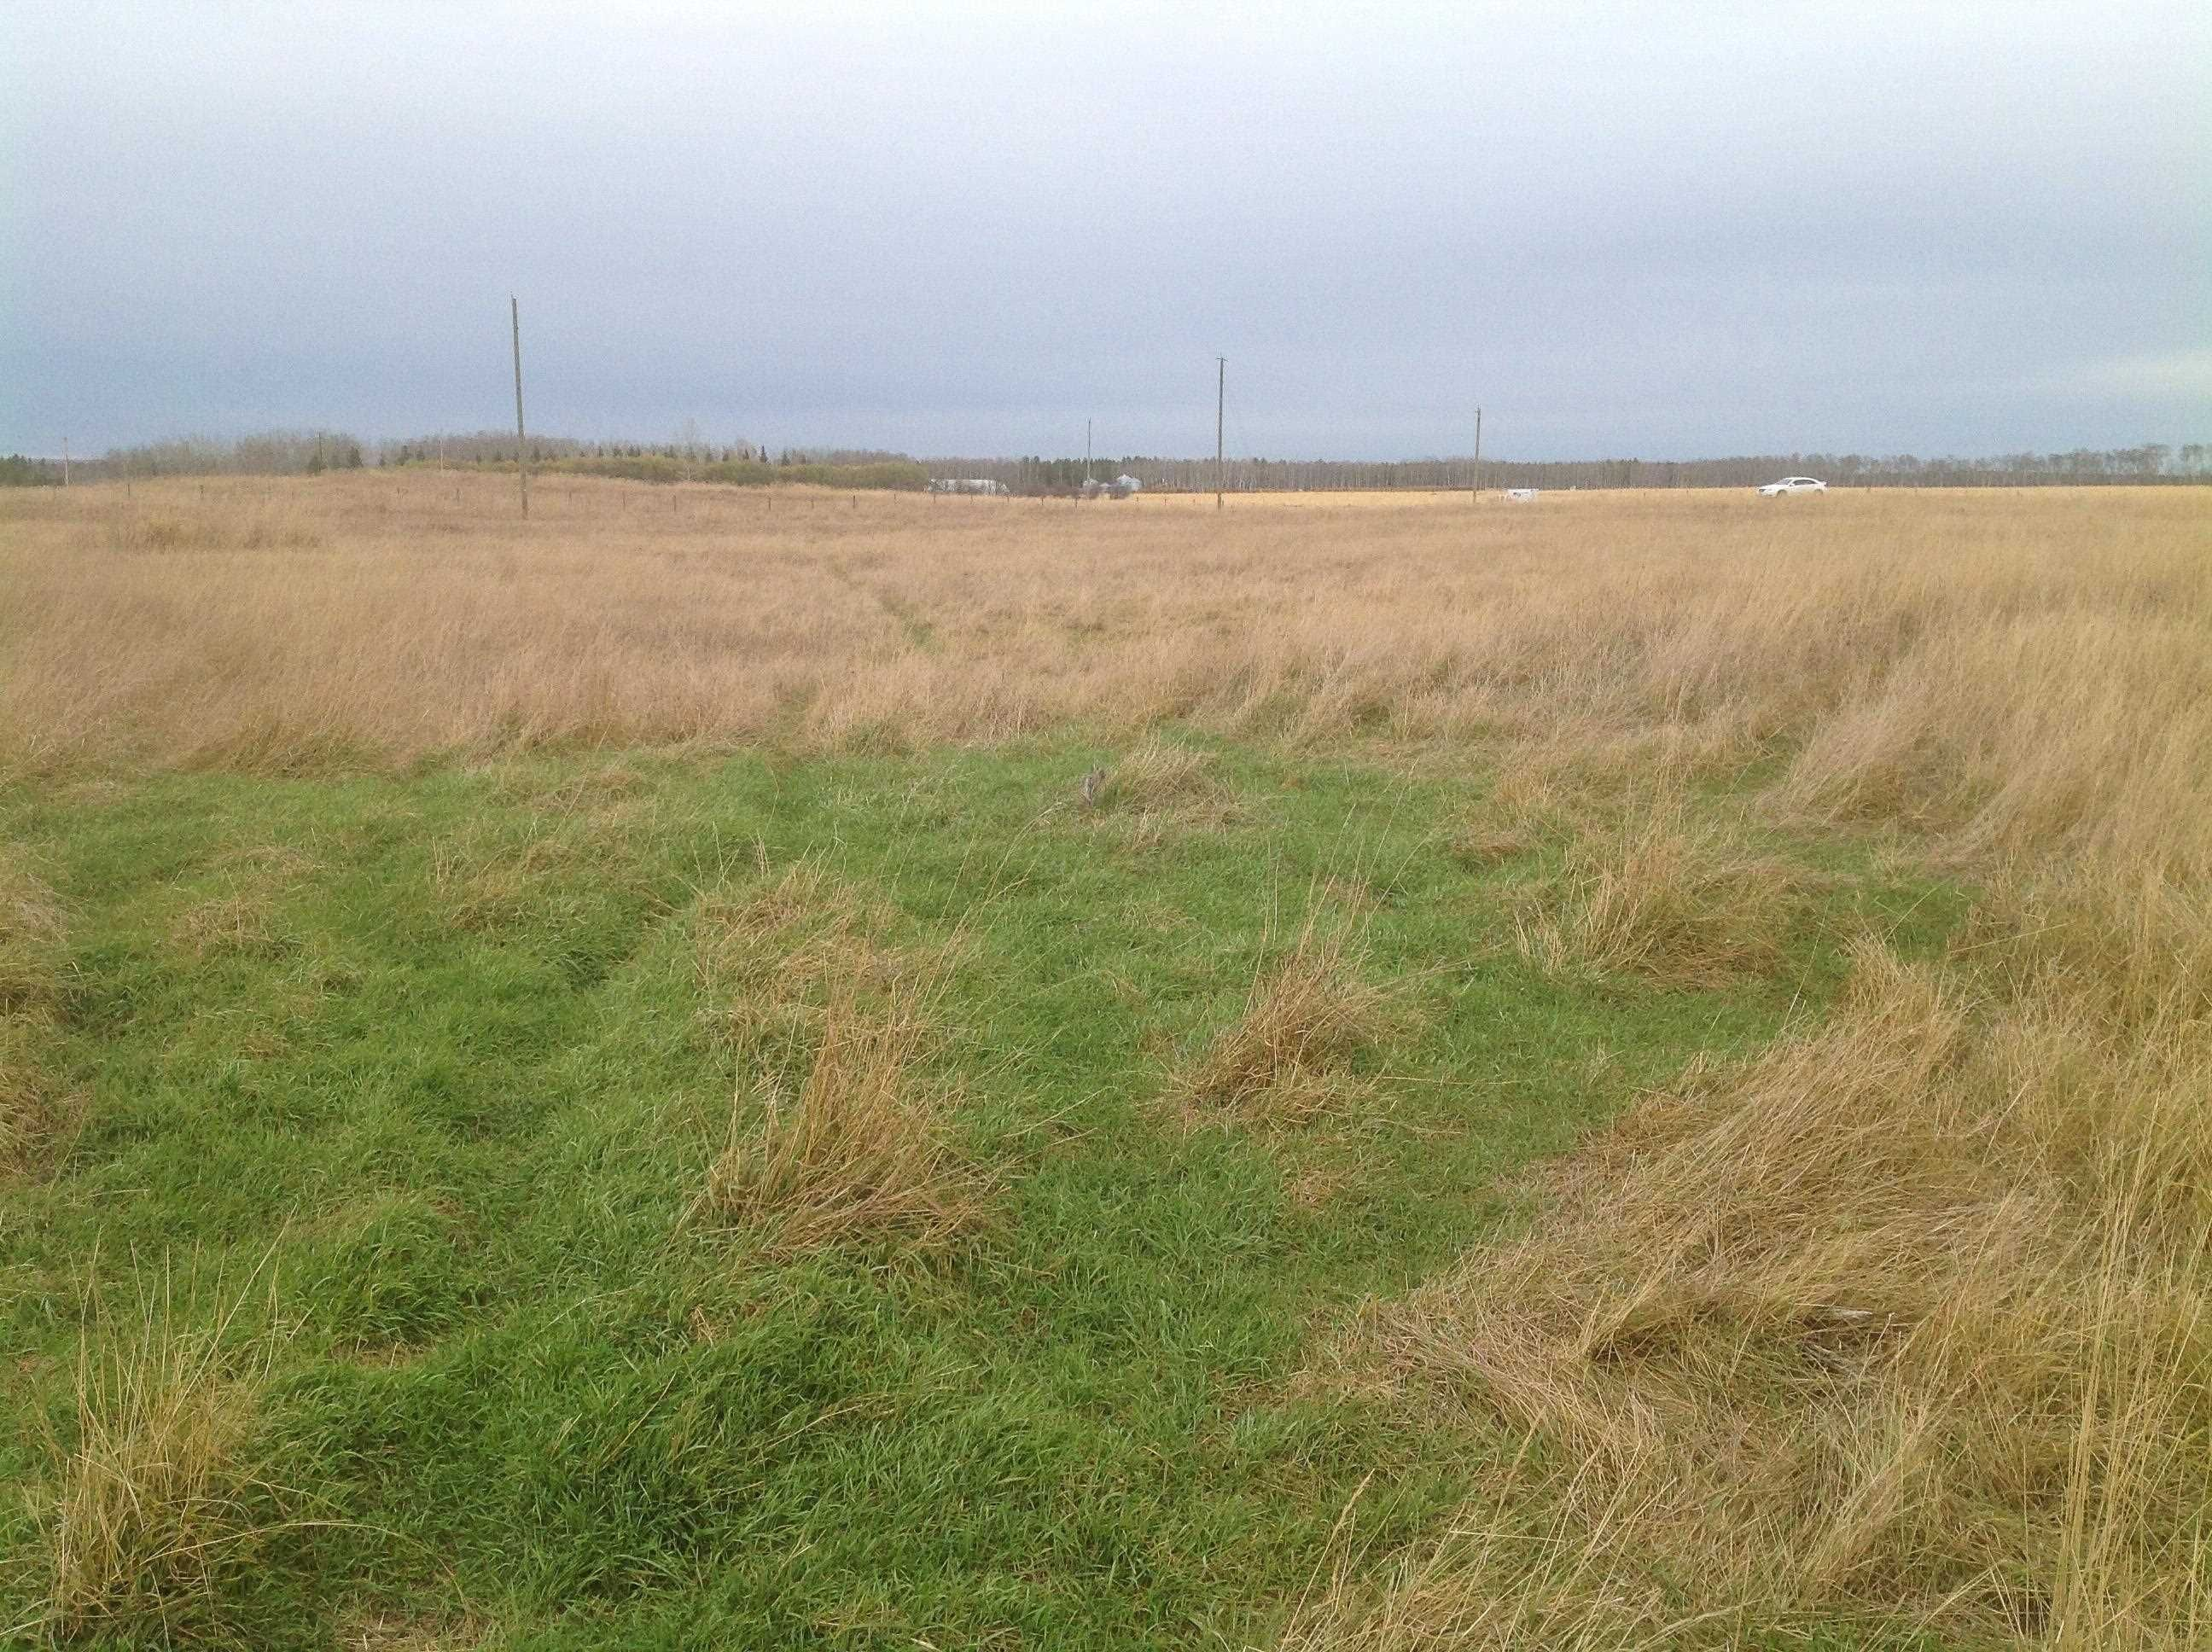 Main Photo: 4 63318 HWY 892: Rural Bonnyville M.D. Rural Land/Vacant Lot for sale : MLS®# E4265712